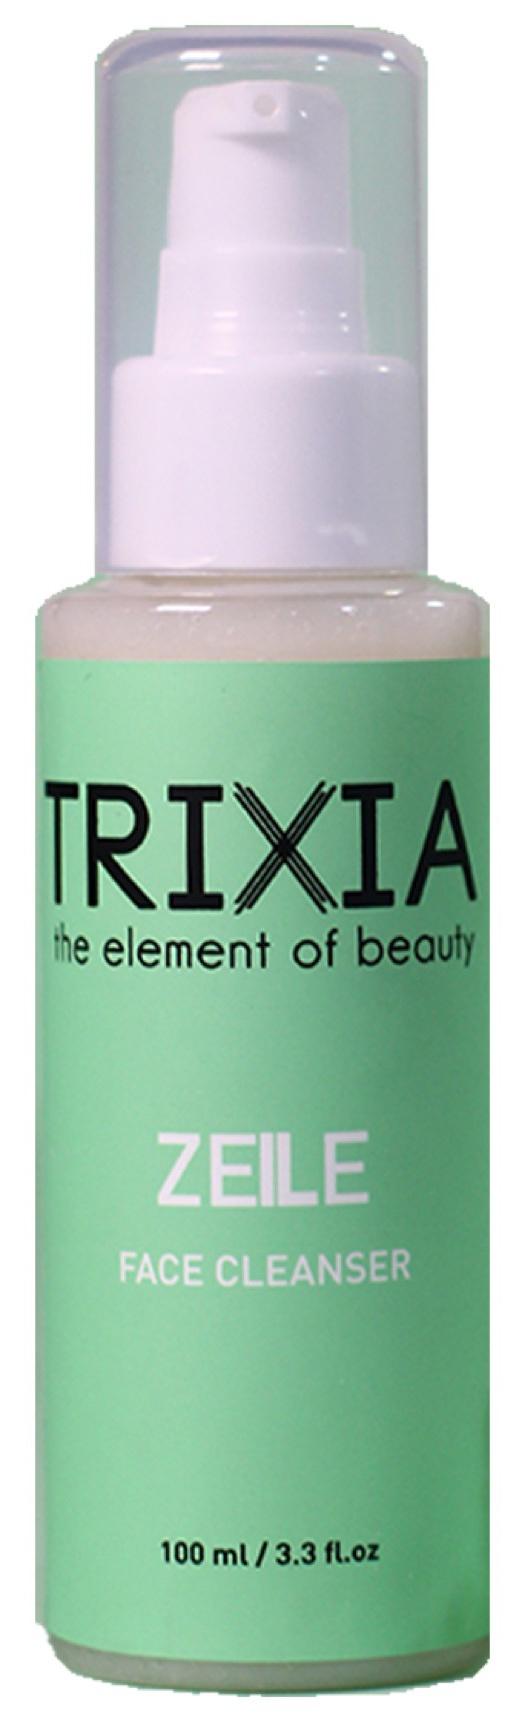 Trixia Zele Face Cleanser